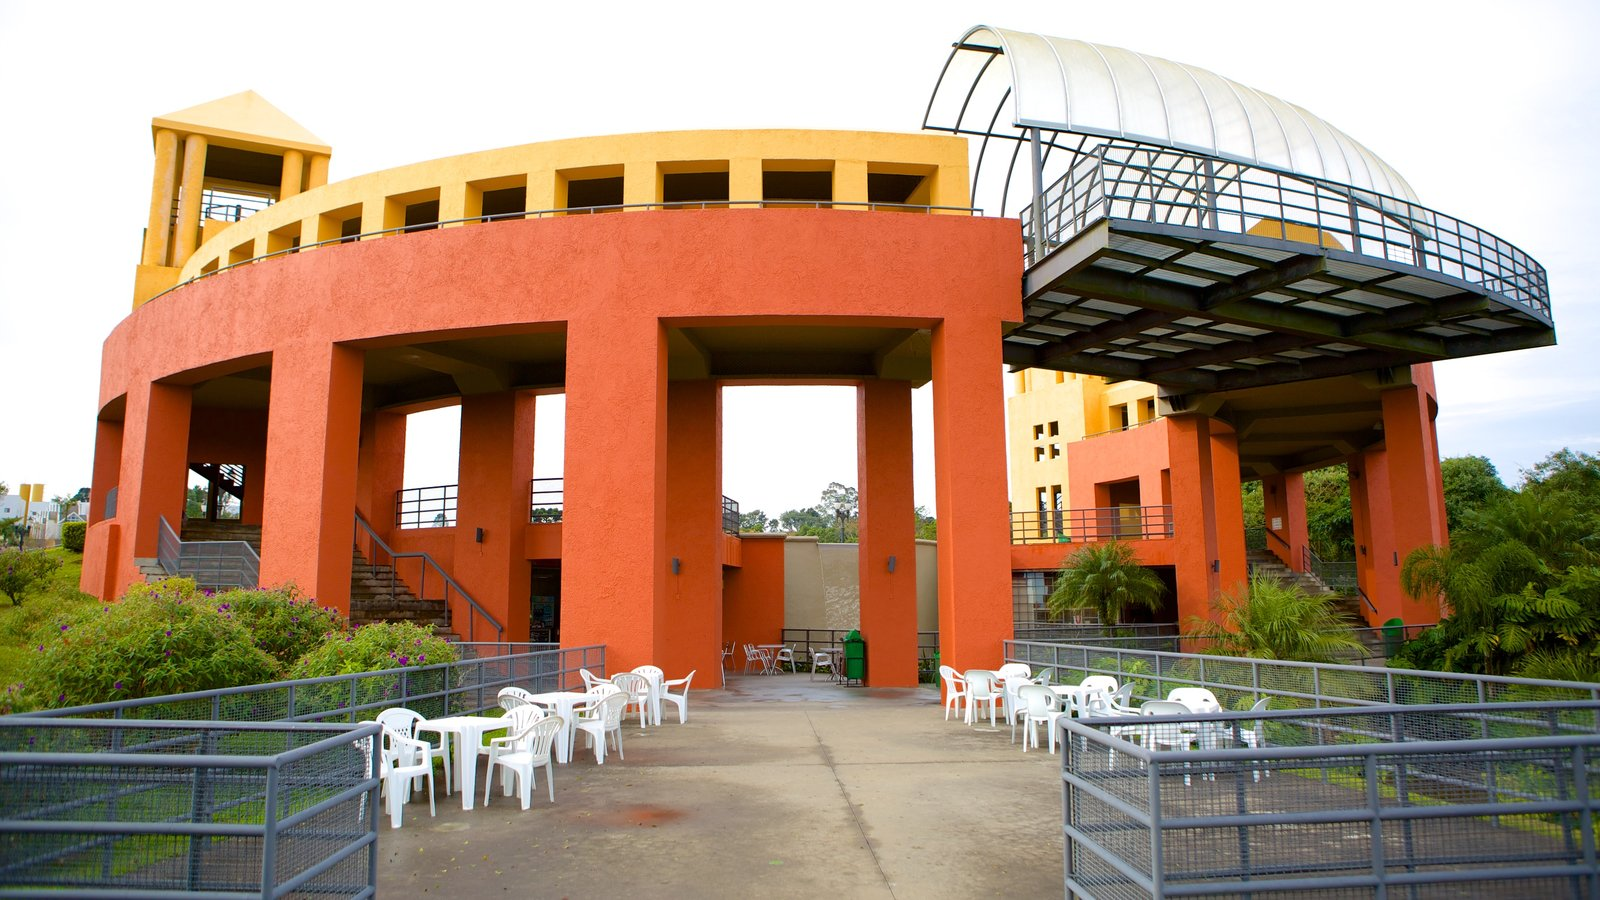 Parque Tanguá caracterizando arquitetura moderna